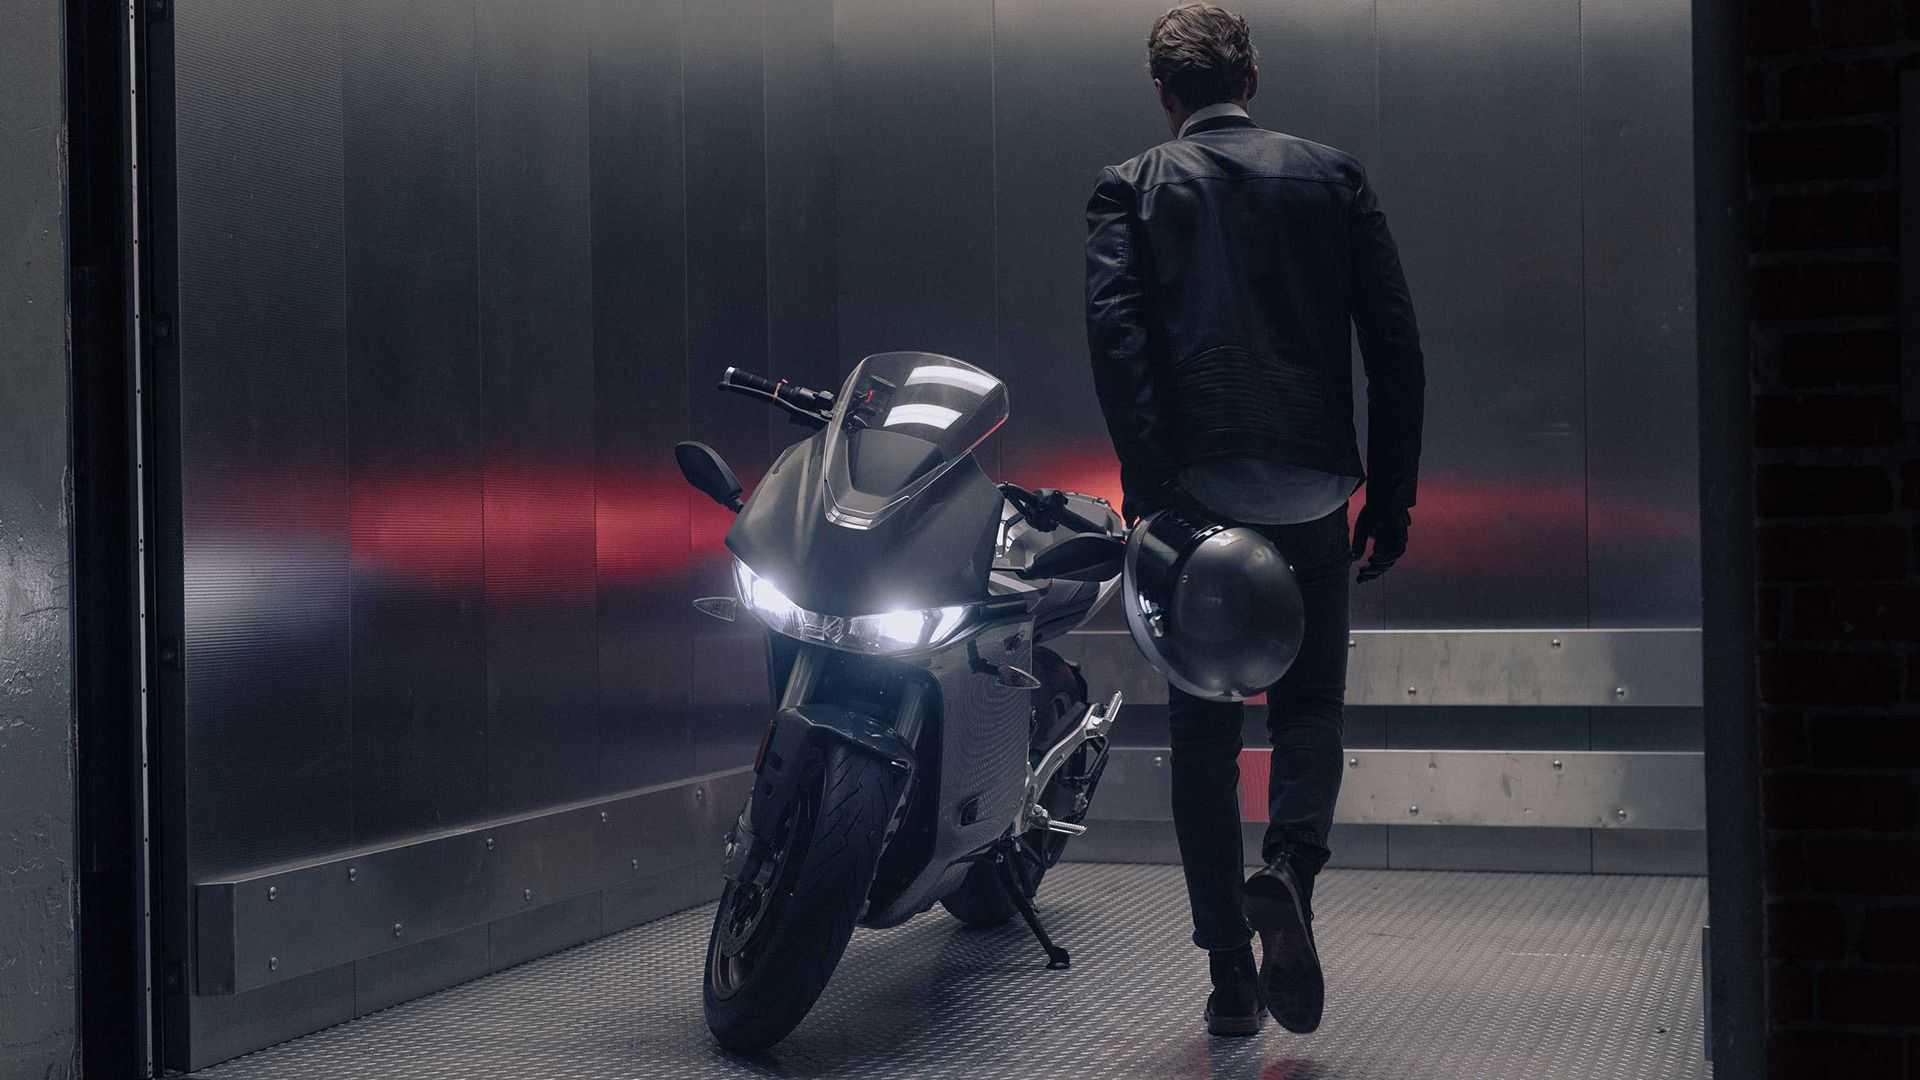 Zero Motorcycles 2021 Srs